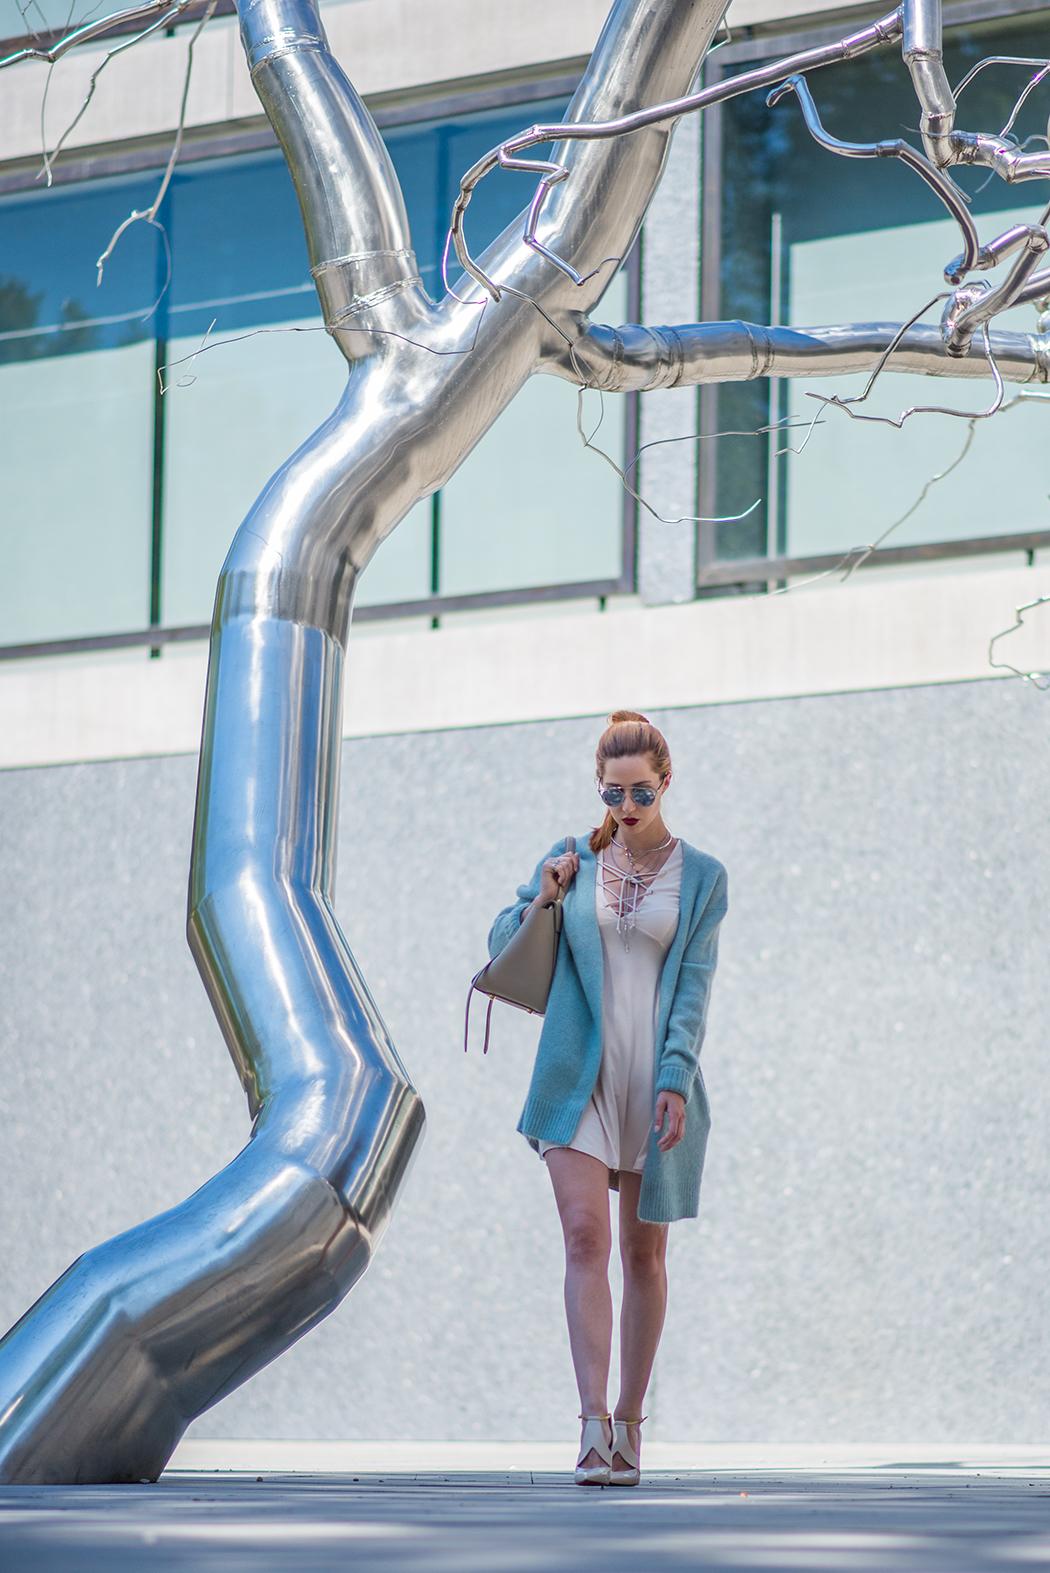 Fashionblog-Fashionblogger-Fashion-Blog-Blogger-Lifestyle-Lindarella-Linda-Rella-Acne-Kaschmirjacke-mint-tuerkis-Dior-so-real-Celine_Belt_Bag-Céline_Tasche-24-web